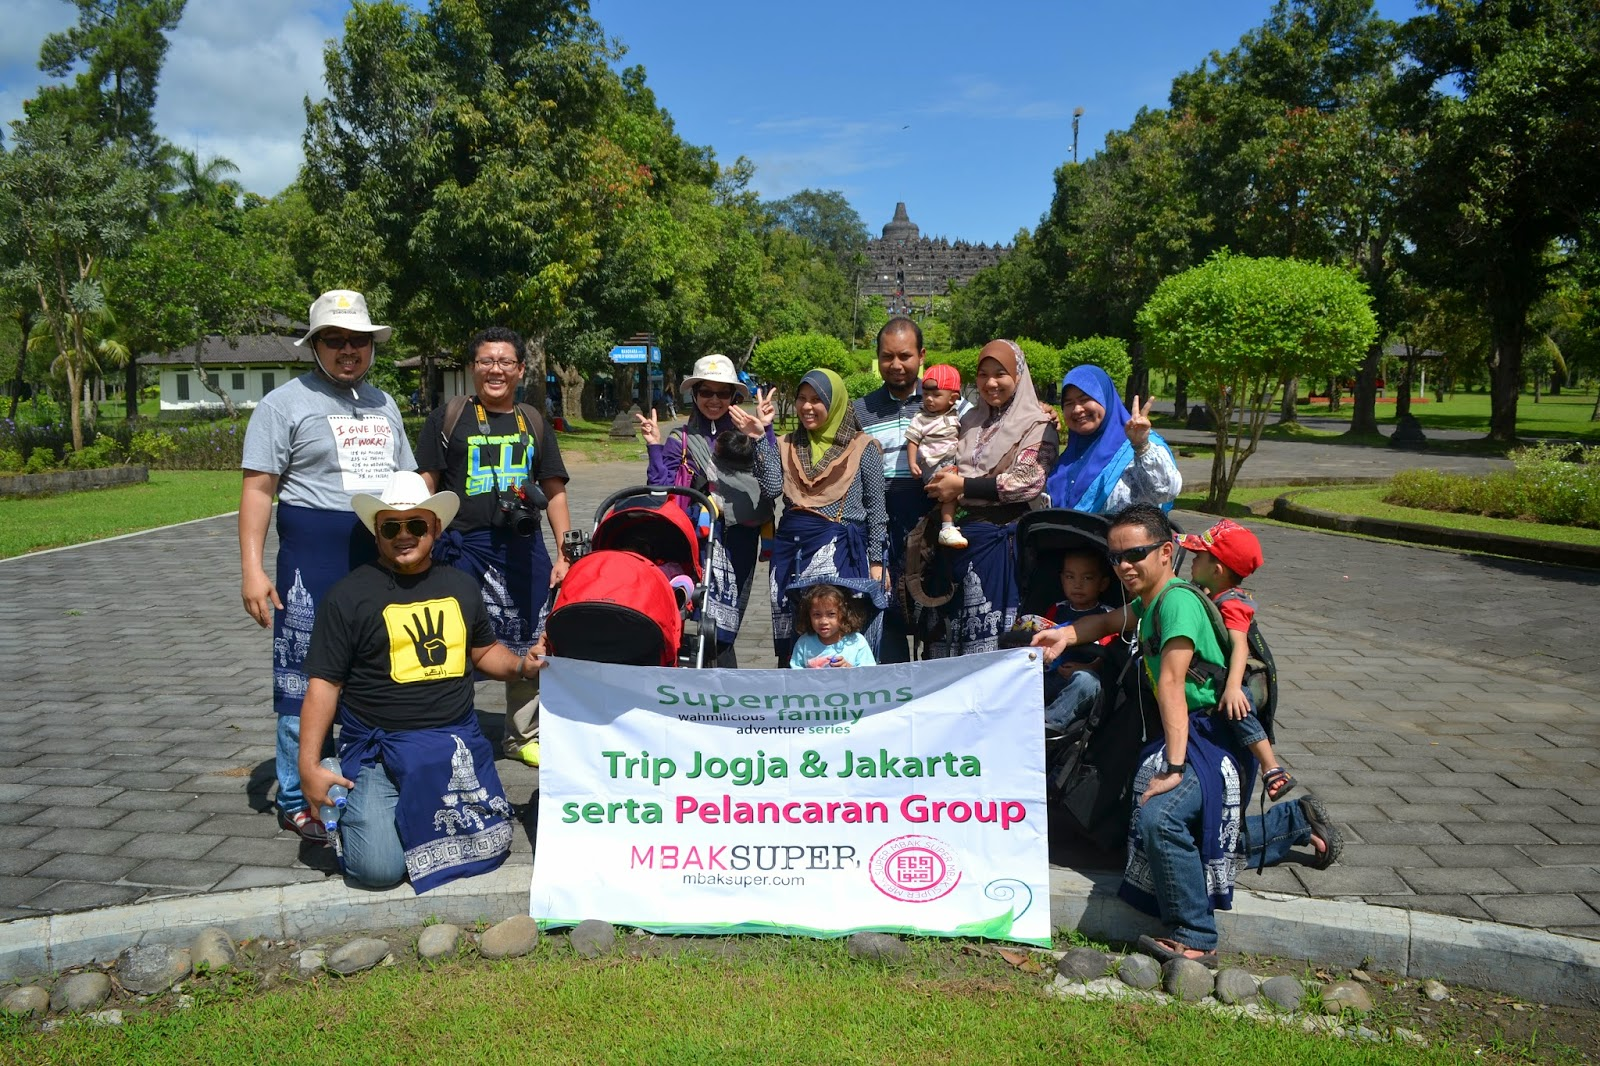 travel indonesia, yogjakarta, ramayana, candi borbudur, kopi luwak, plentong batik, melia hotel & resort spa, yogjakarta travel tours